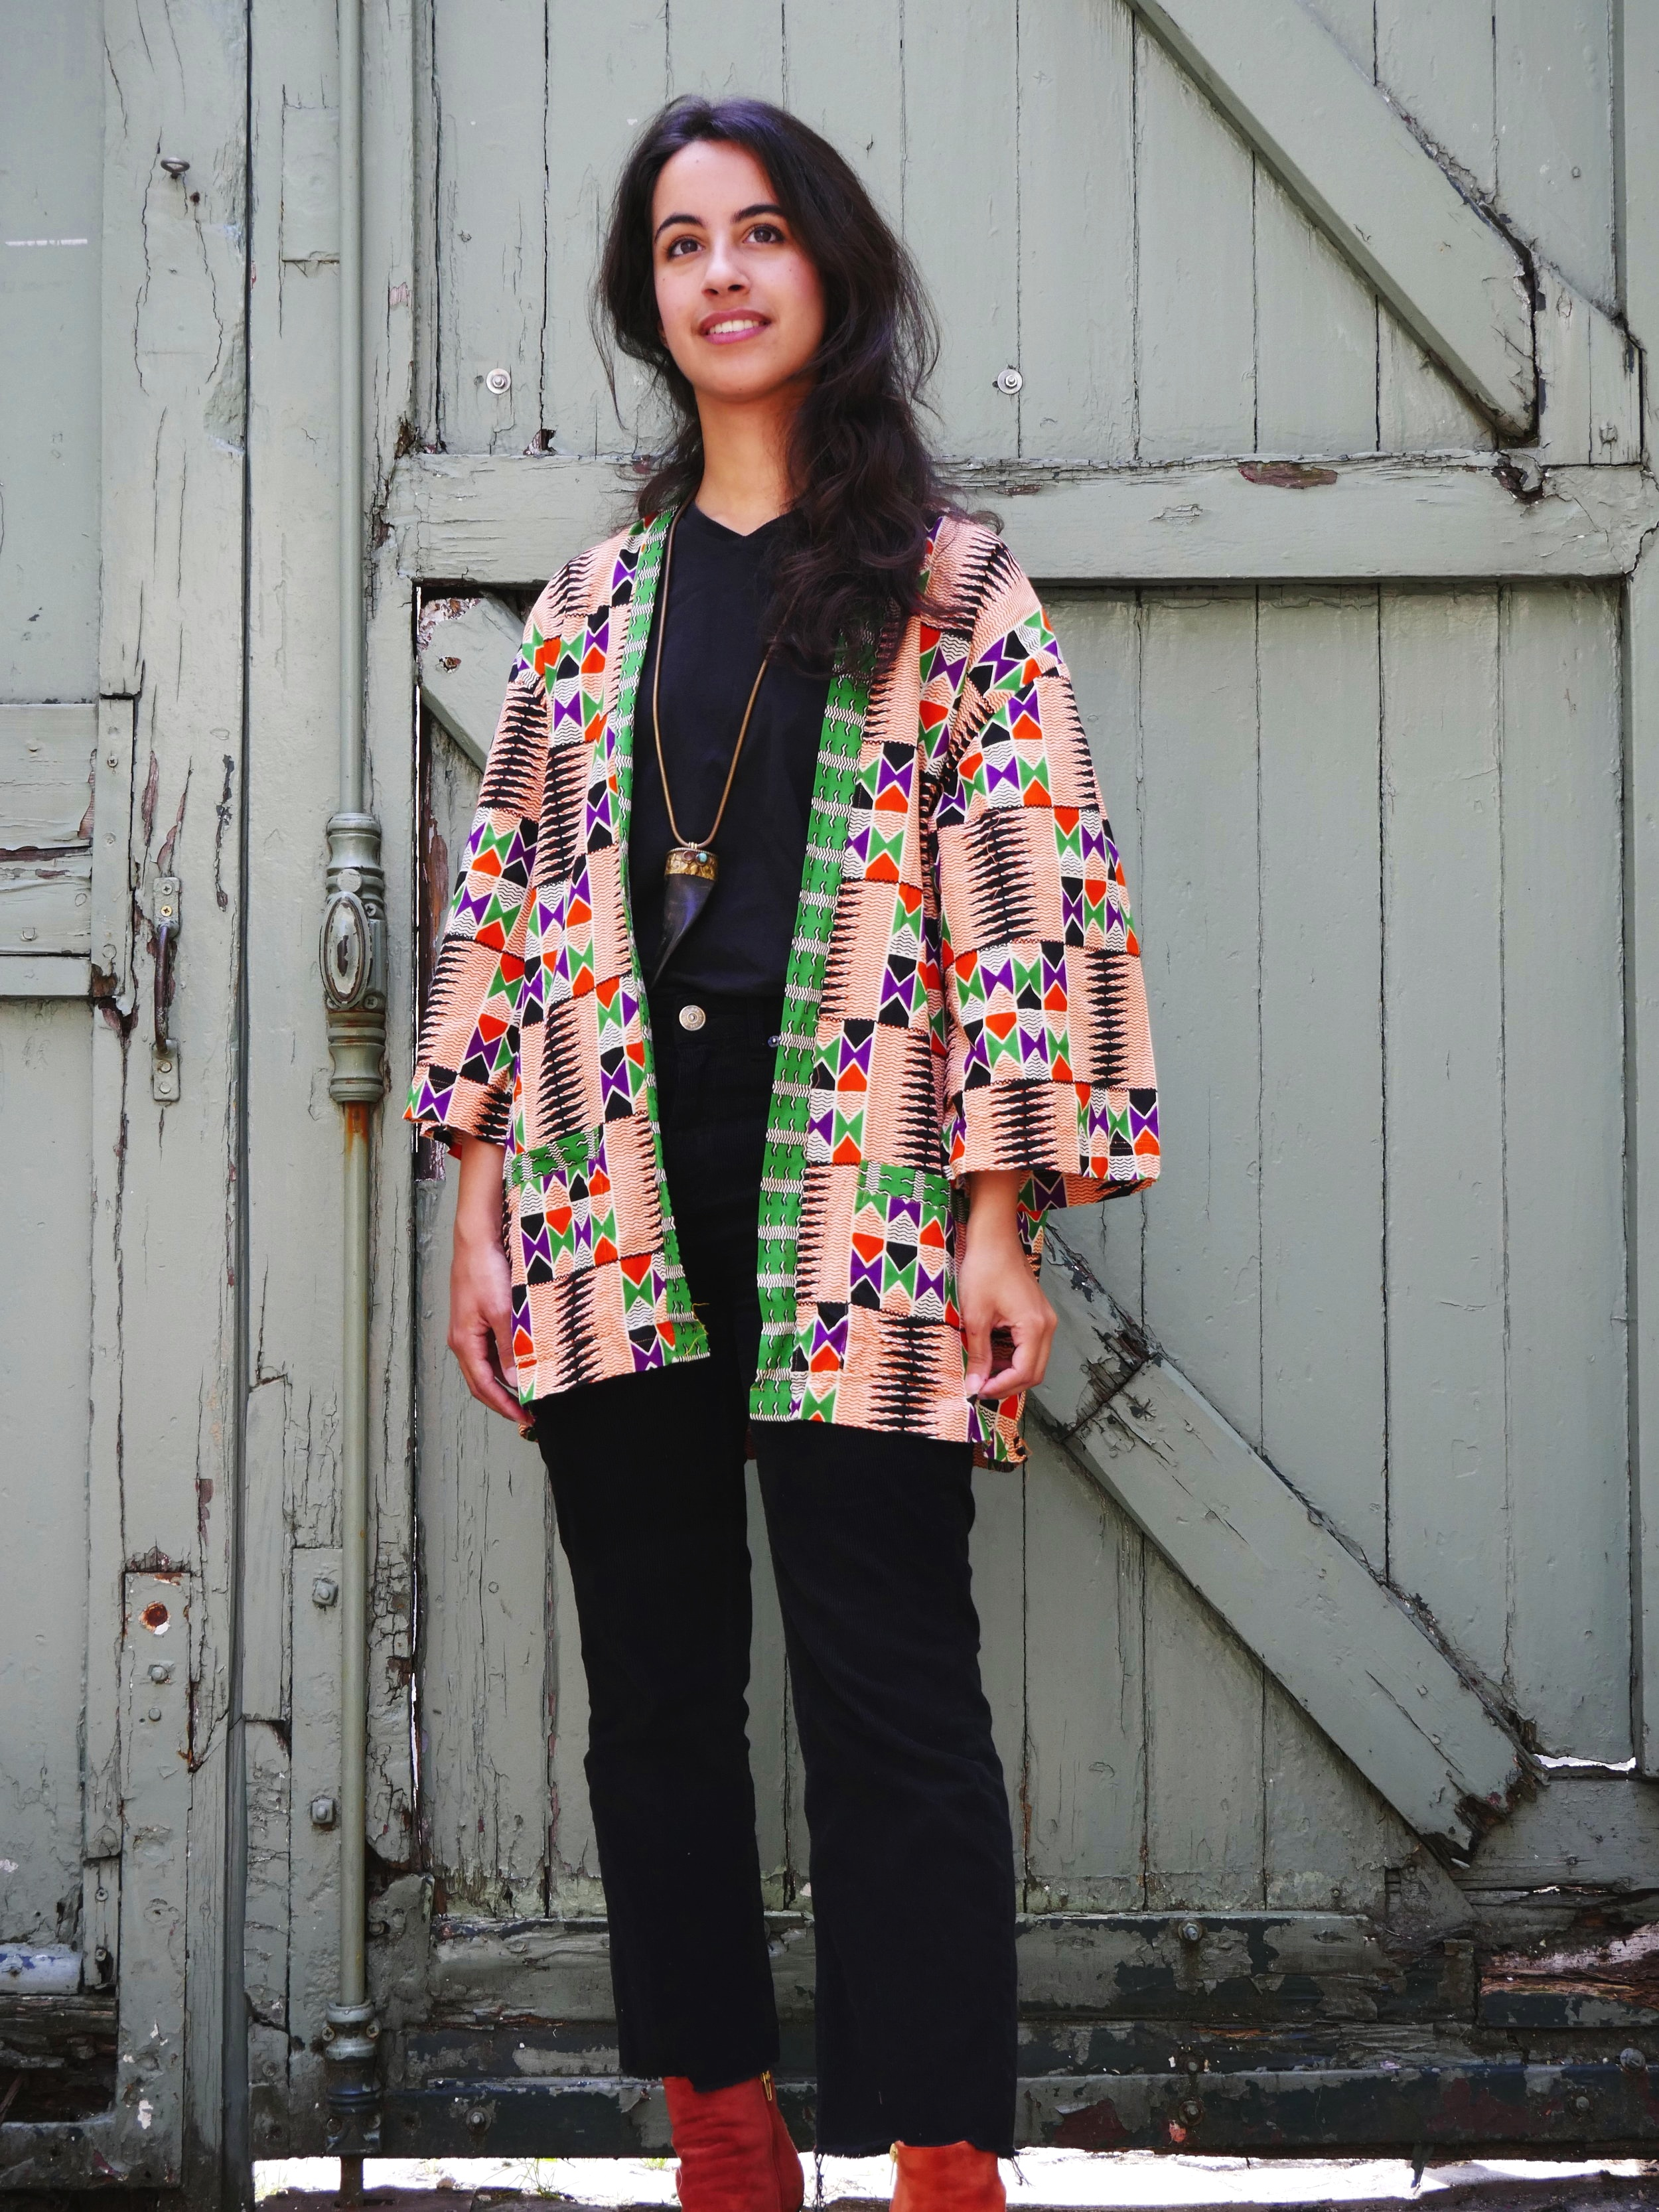 Melissa Orange Wax Kimono - Waxed cotton bought in Senegal, made in Bangladesh with love